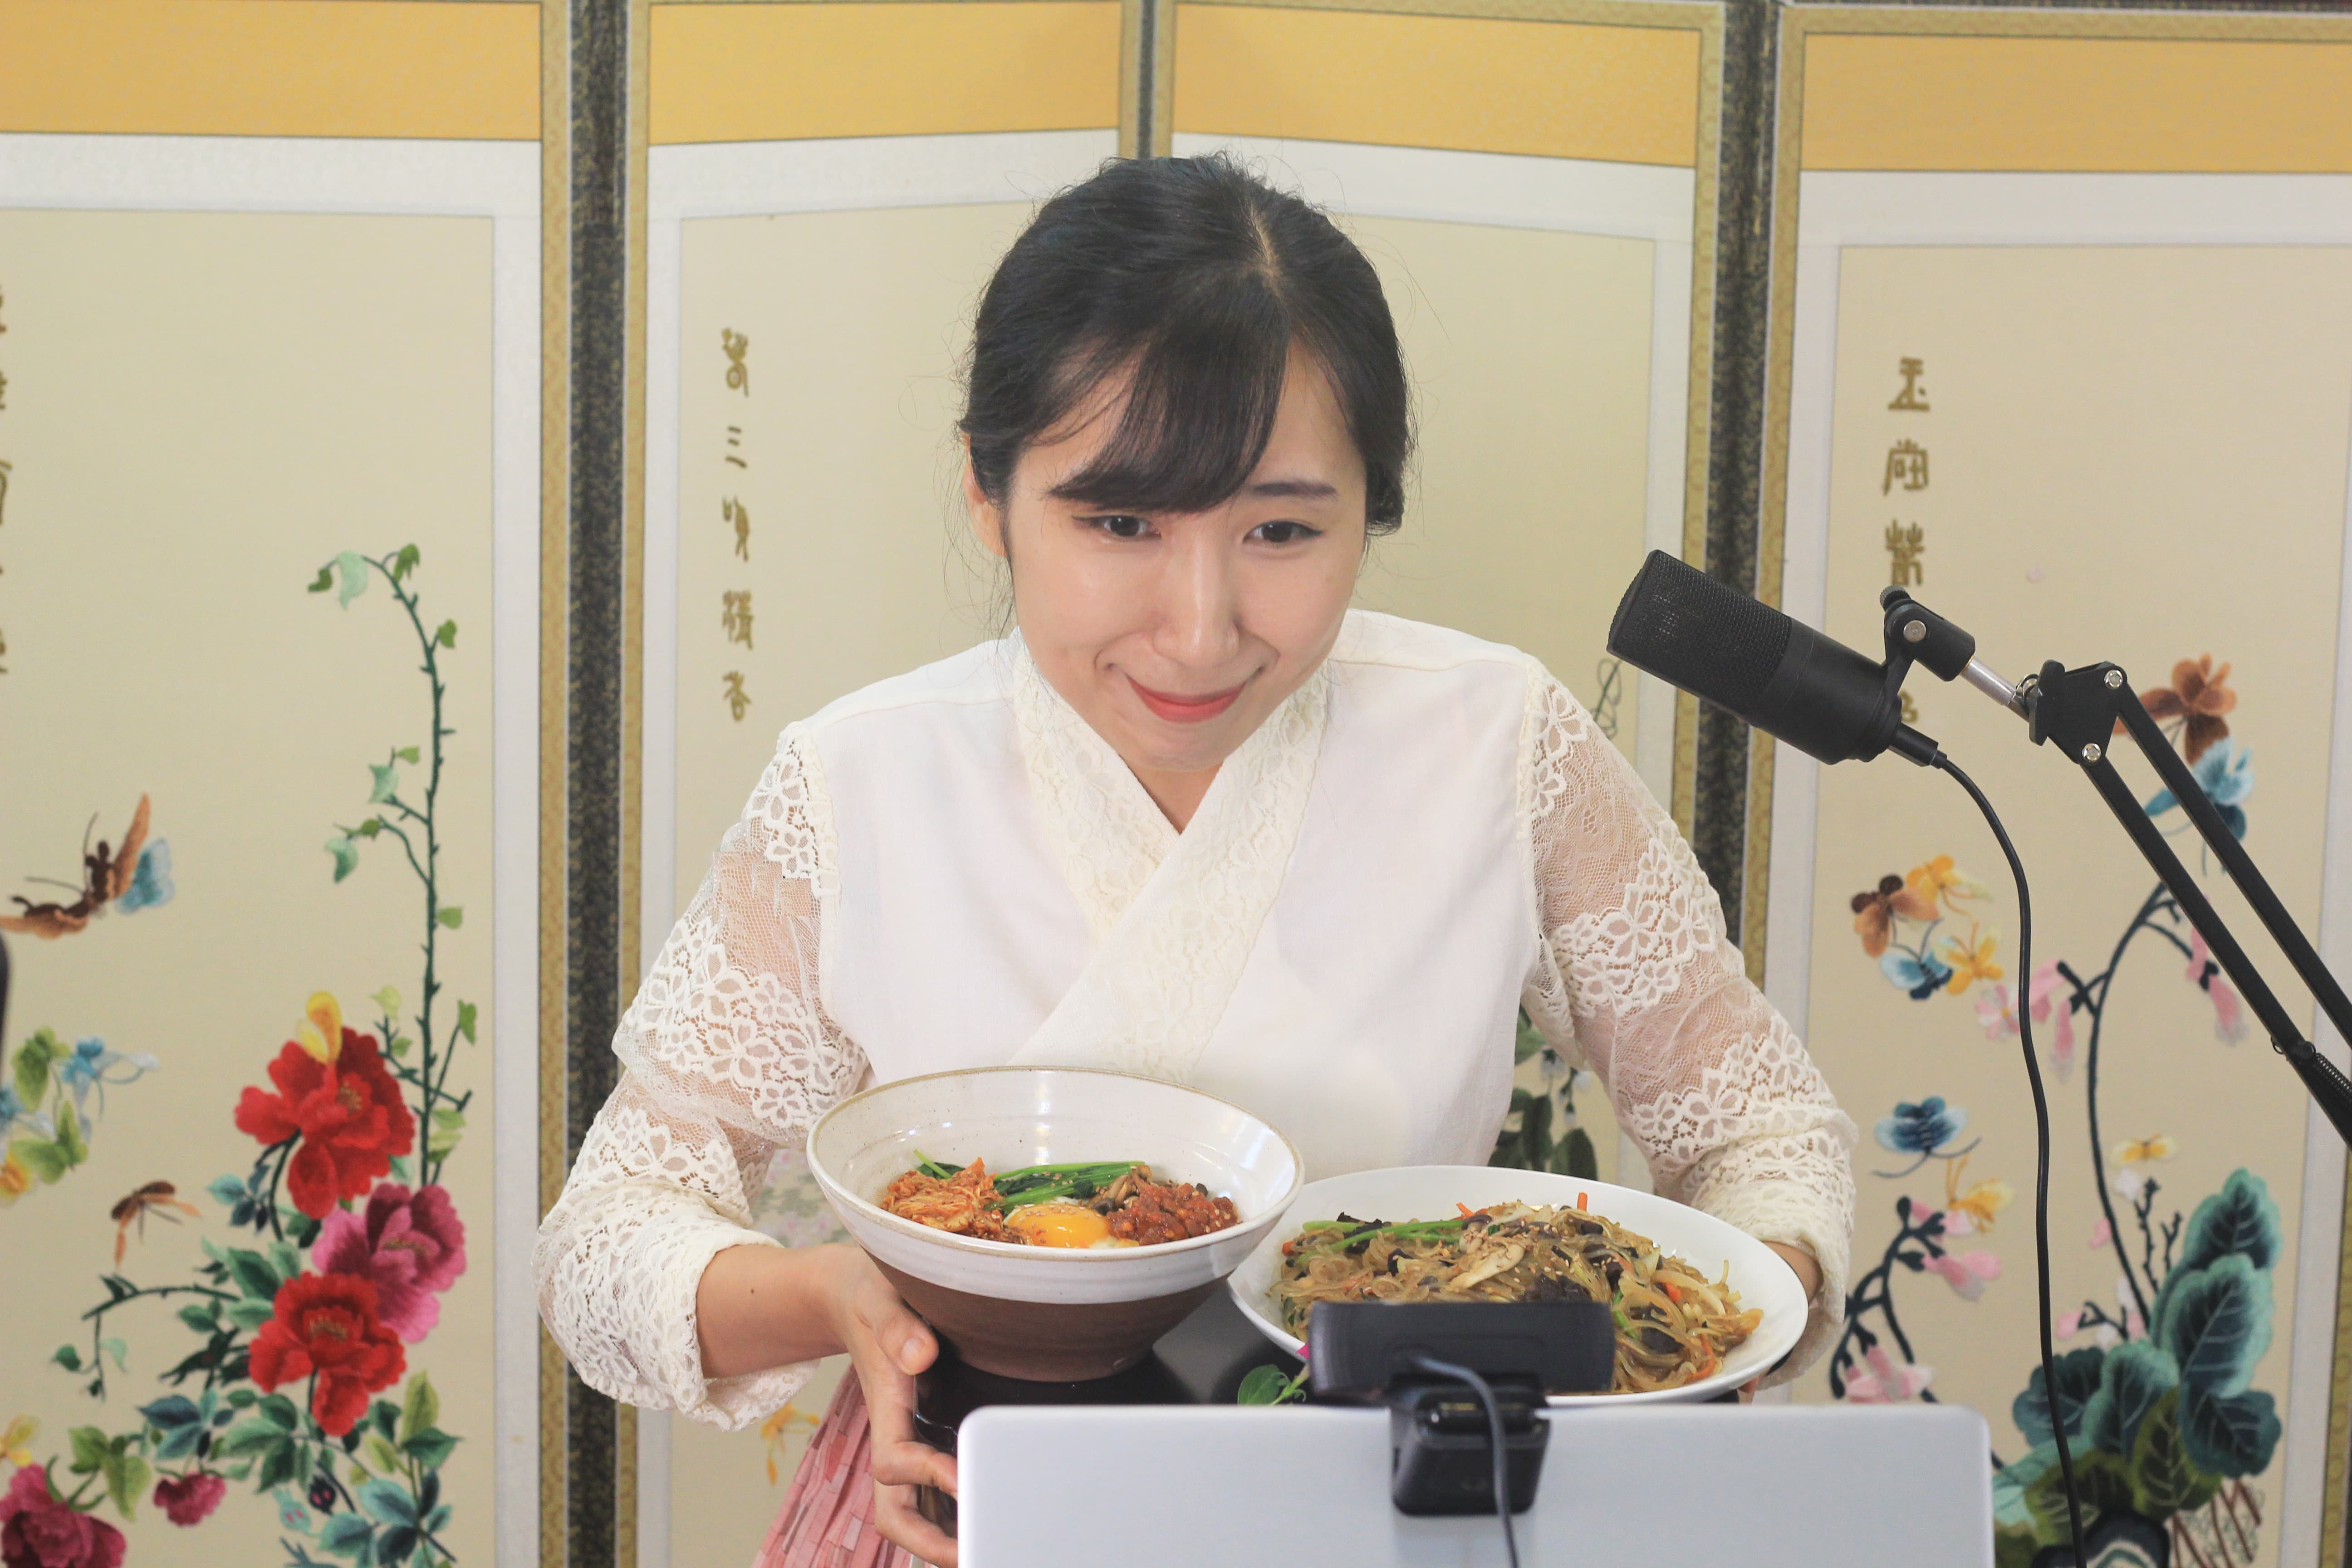 [SMA Insider] 온라인으로 함께 만들고 맛보는 한식… 'K-쿠킹' 주도하는 김민선 오미요리연구소 대표